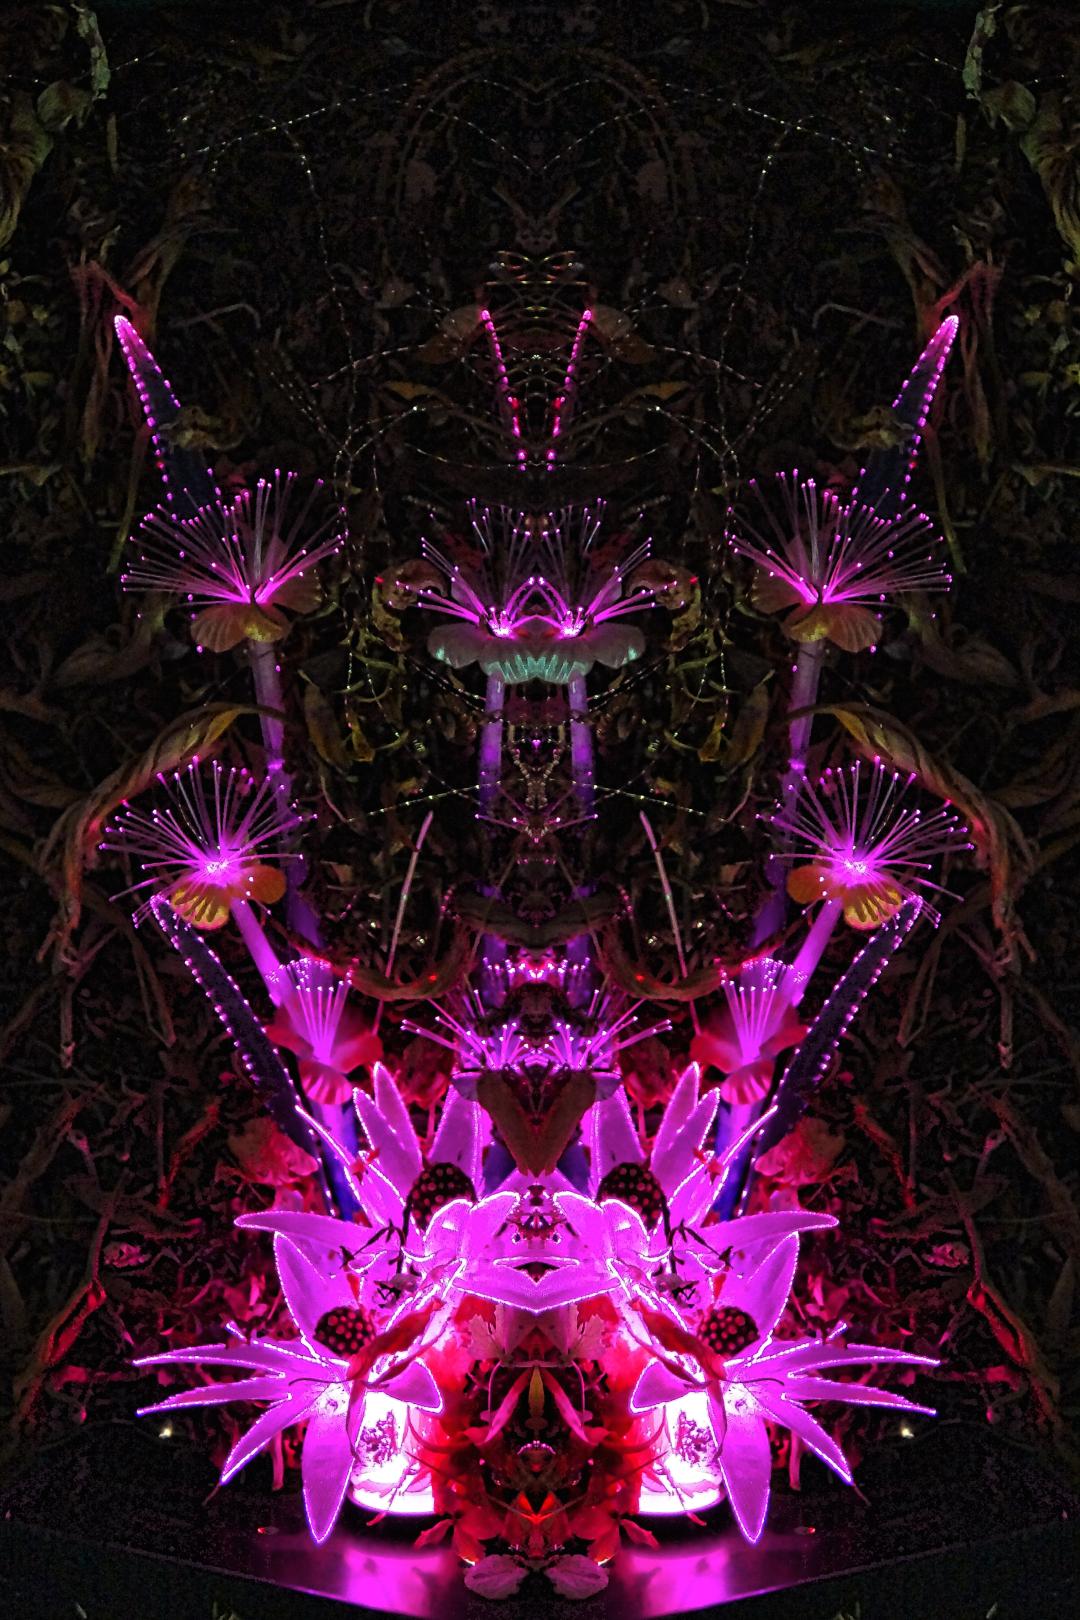 stephen calhoun